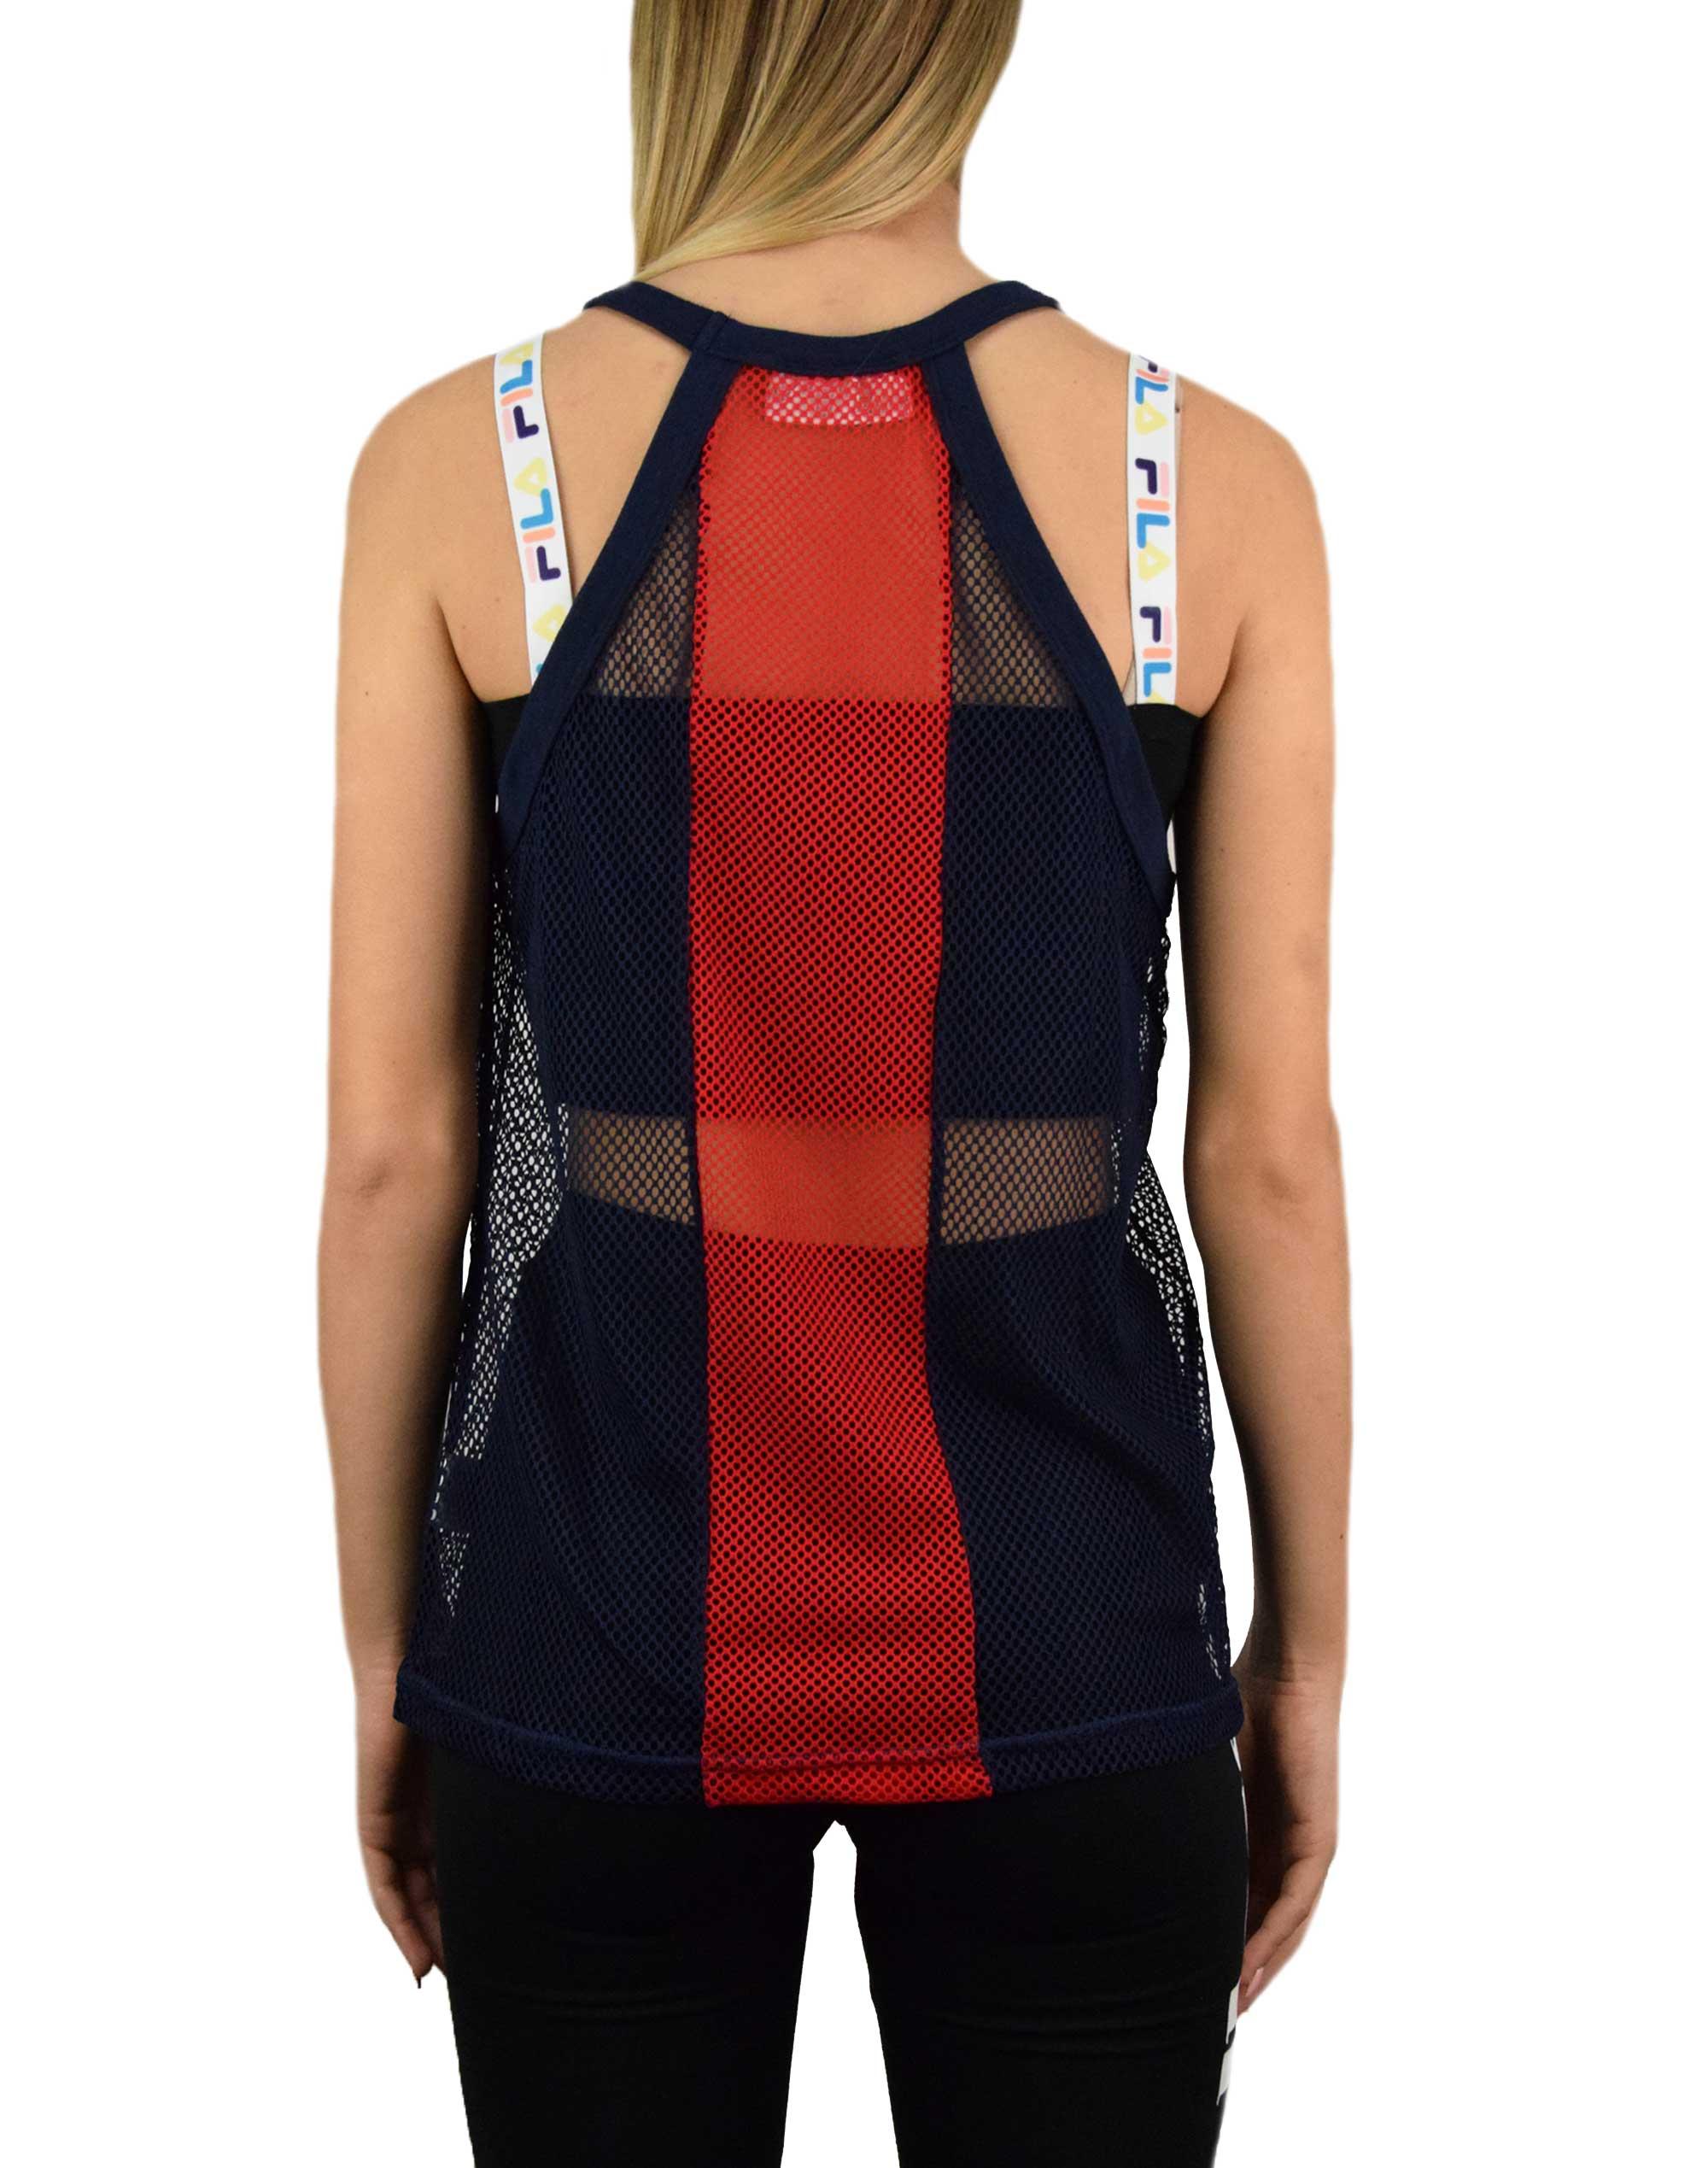 Fila Bobbi Stripe Mesh Vest (LW015986 410) Peacoat/Chinesse Red/White